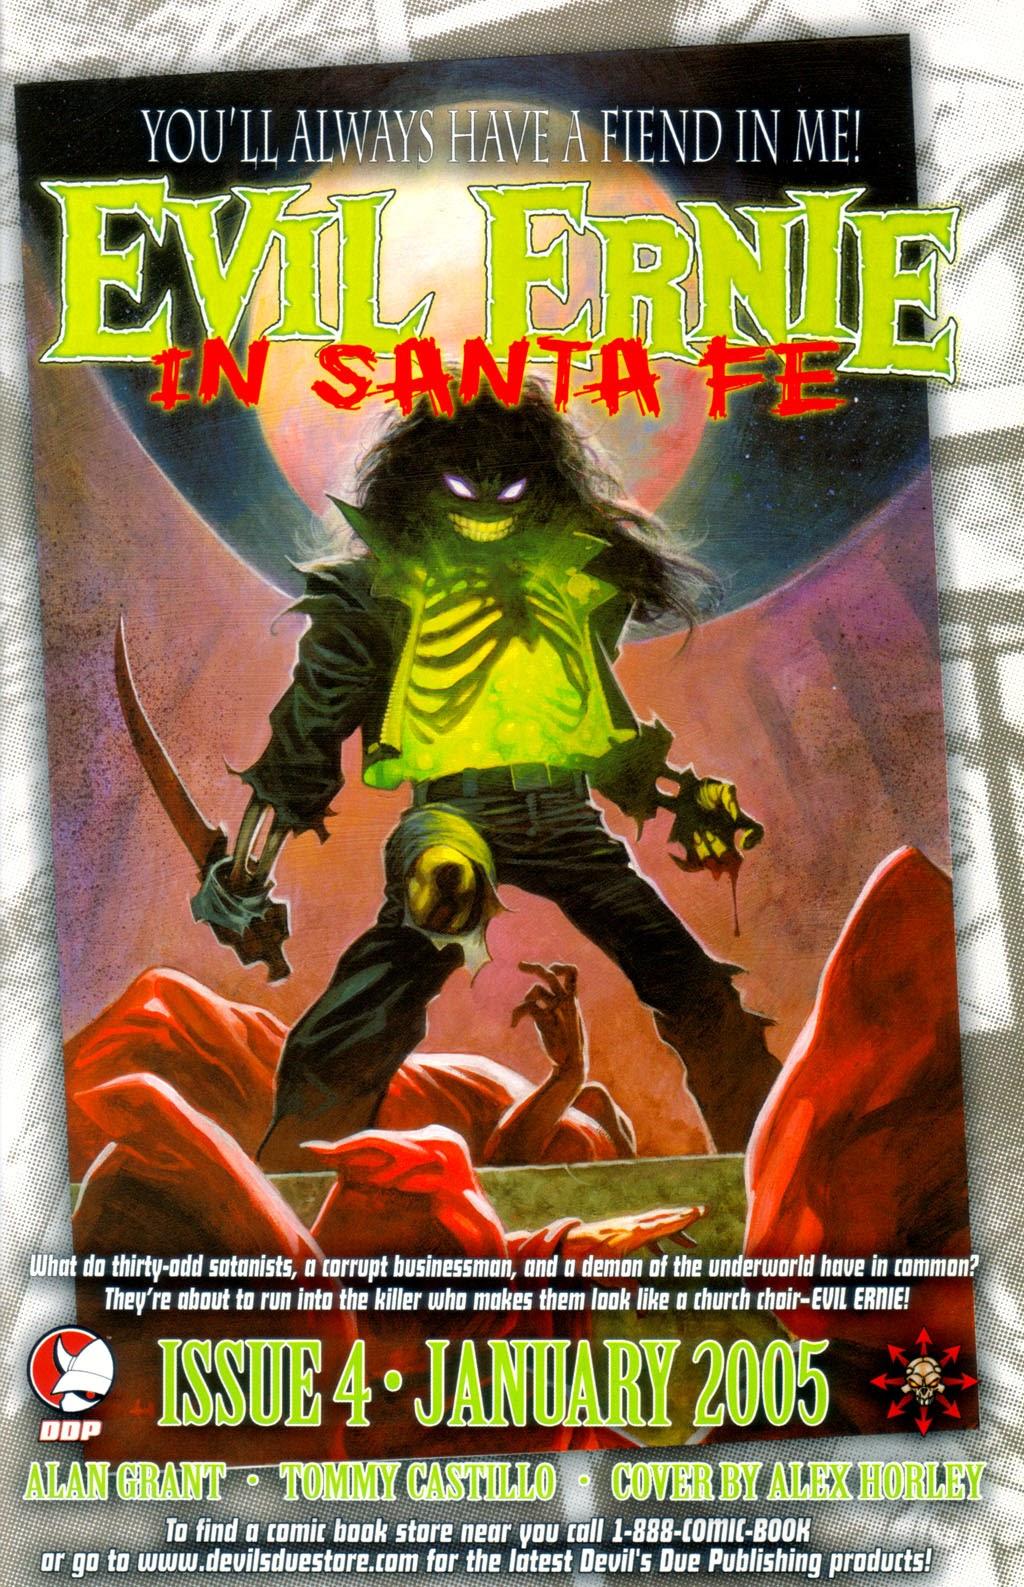 Read online Evil Ernie in Santa Fe comic -  Issue #3 - 24